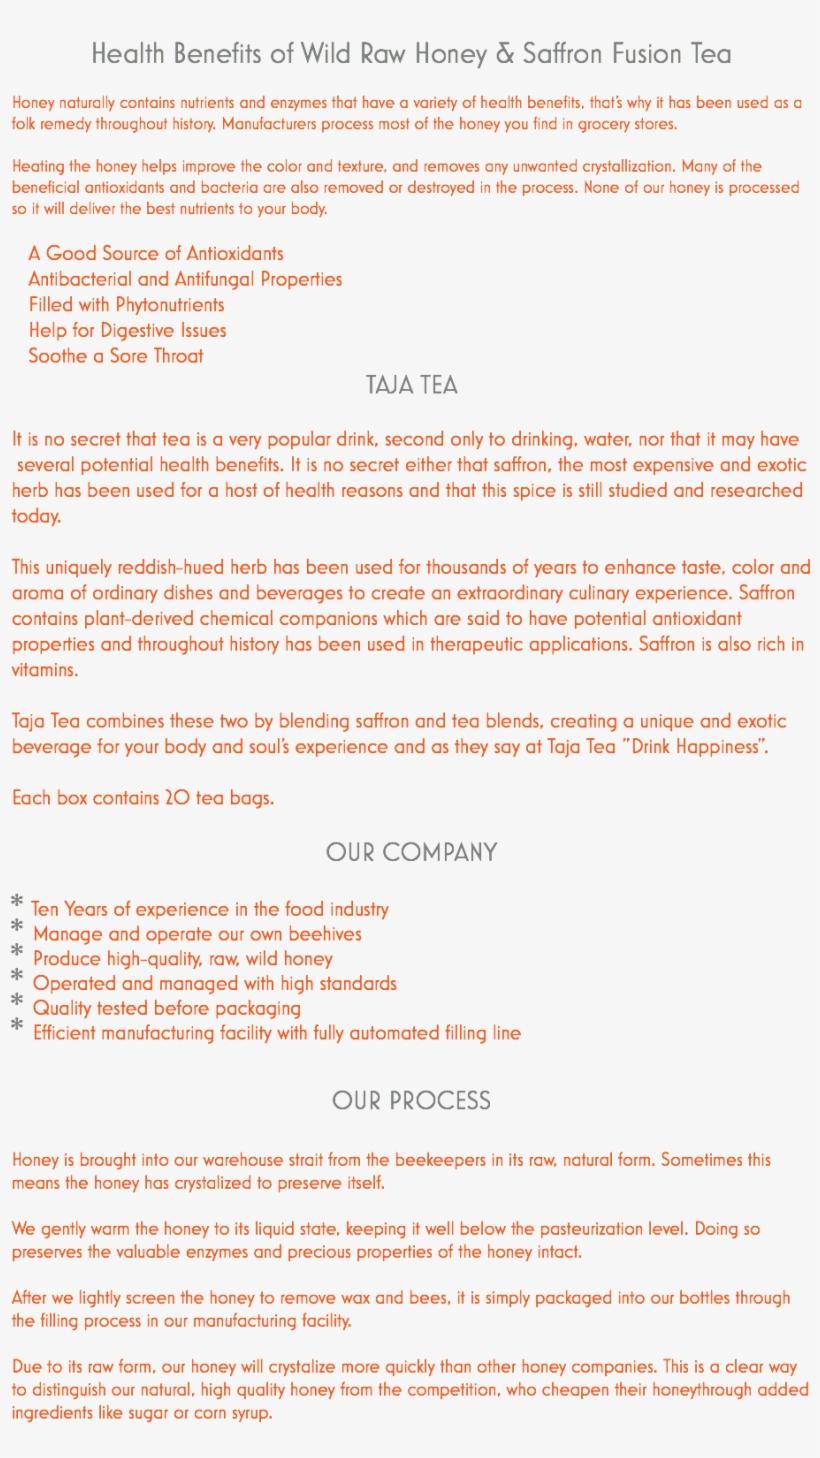 Health Benefits Of Wild Raw Honey & Saffron Fusion - Health, transparent png #4976345